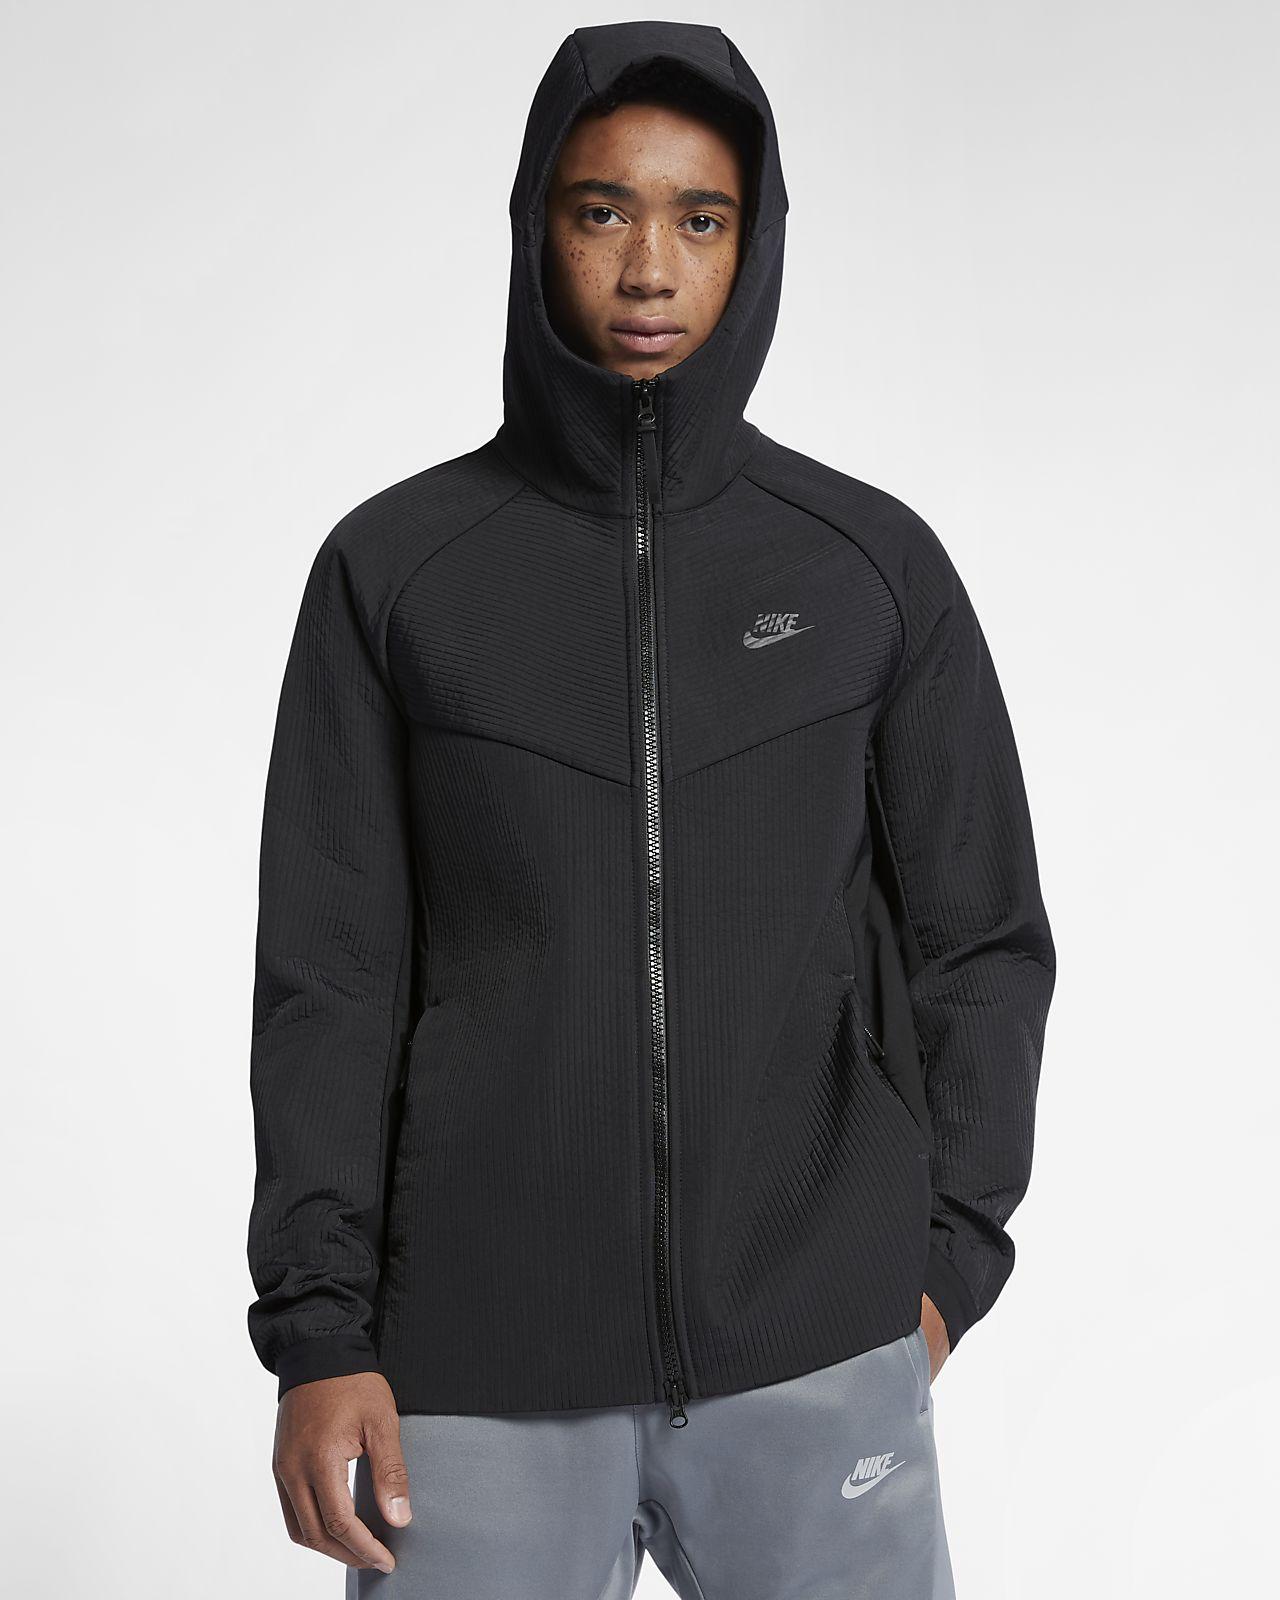 Nike Sportswear Tech Pack Herren Webjacke mit Kapuze